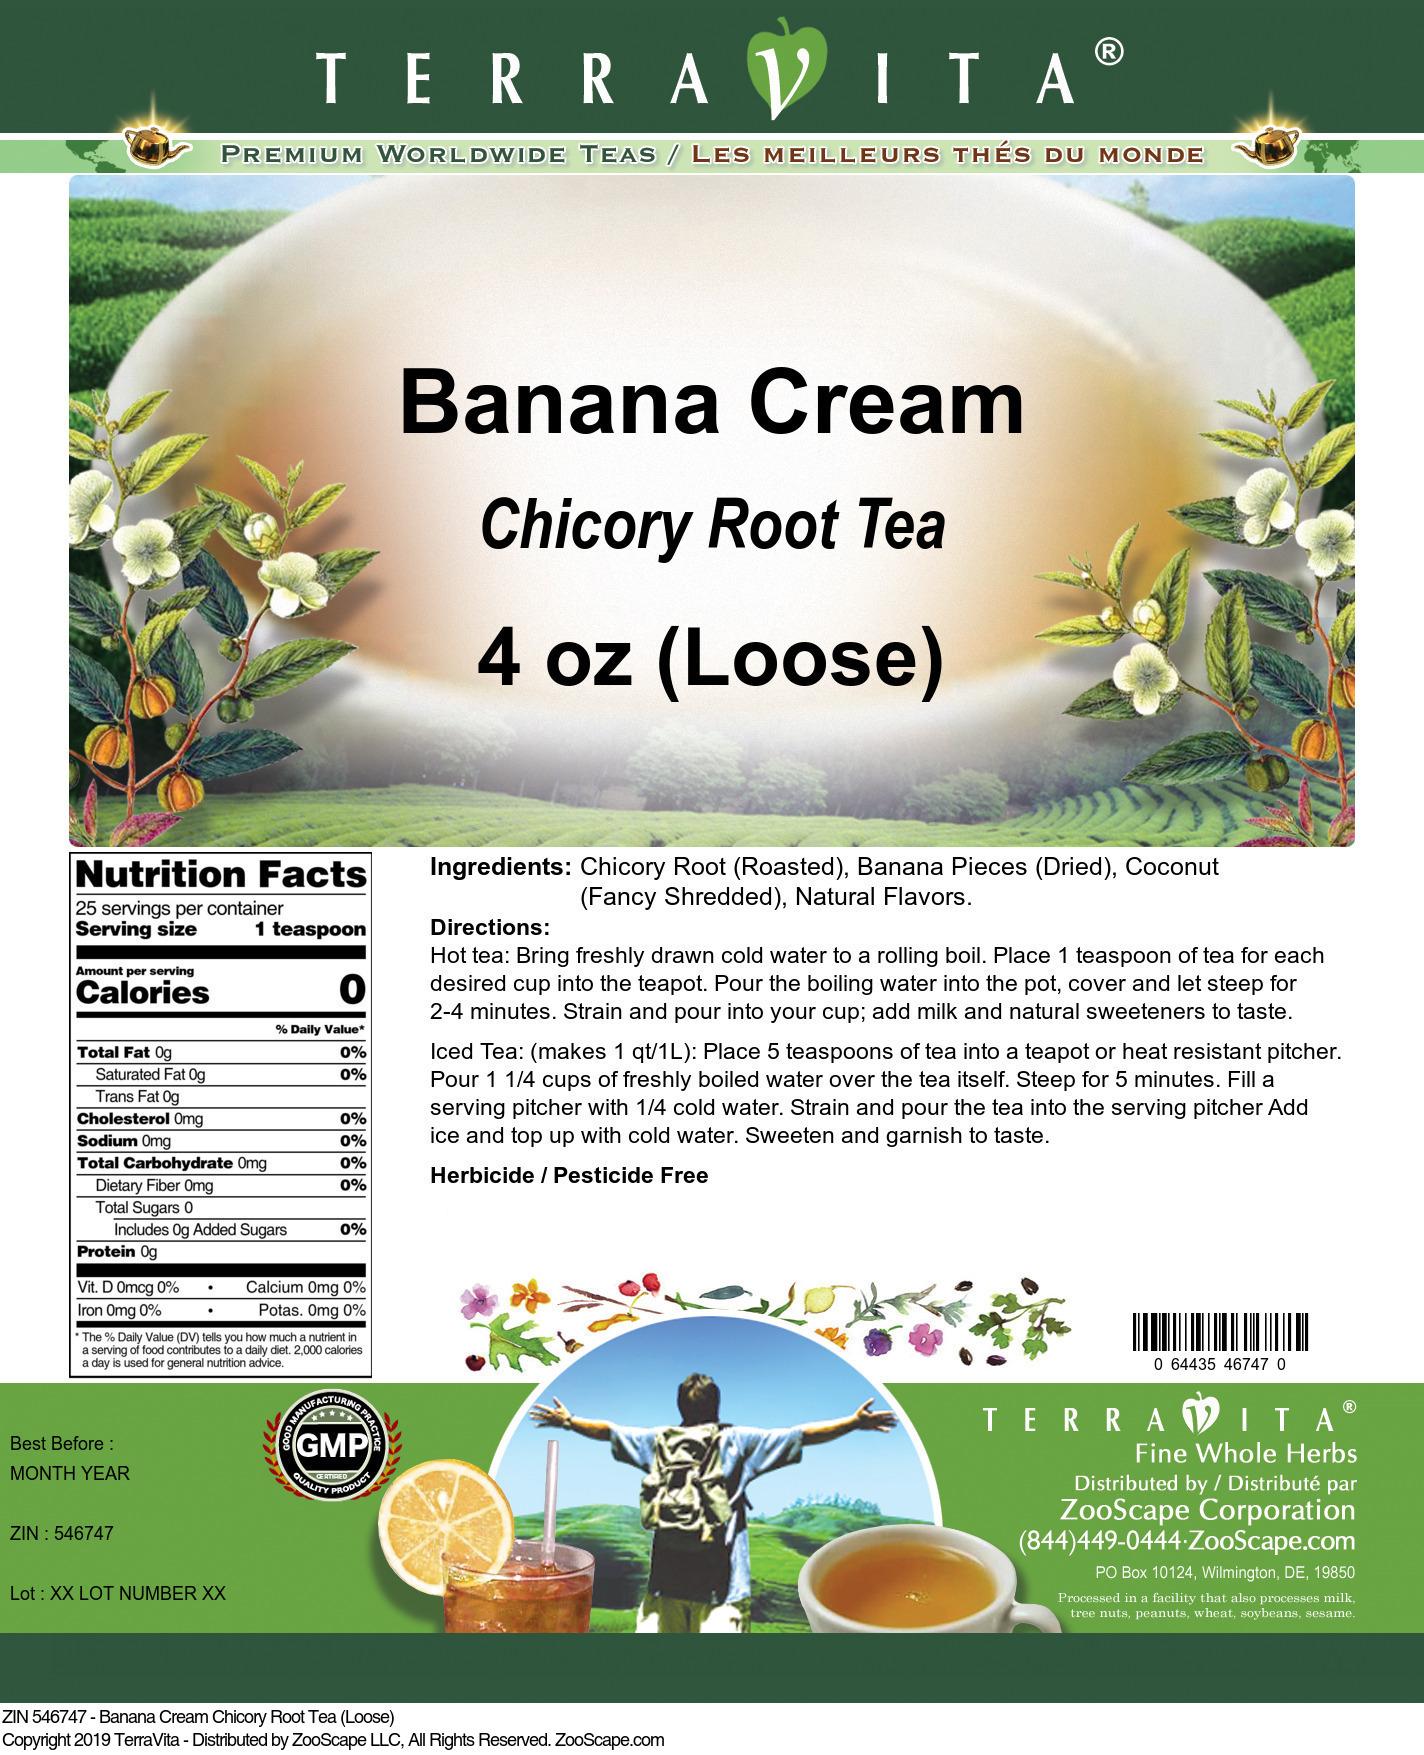 Banana Cream Chicory Root Tea (Loose)